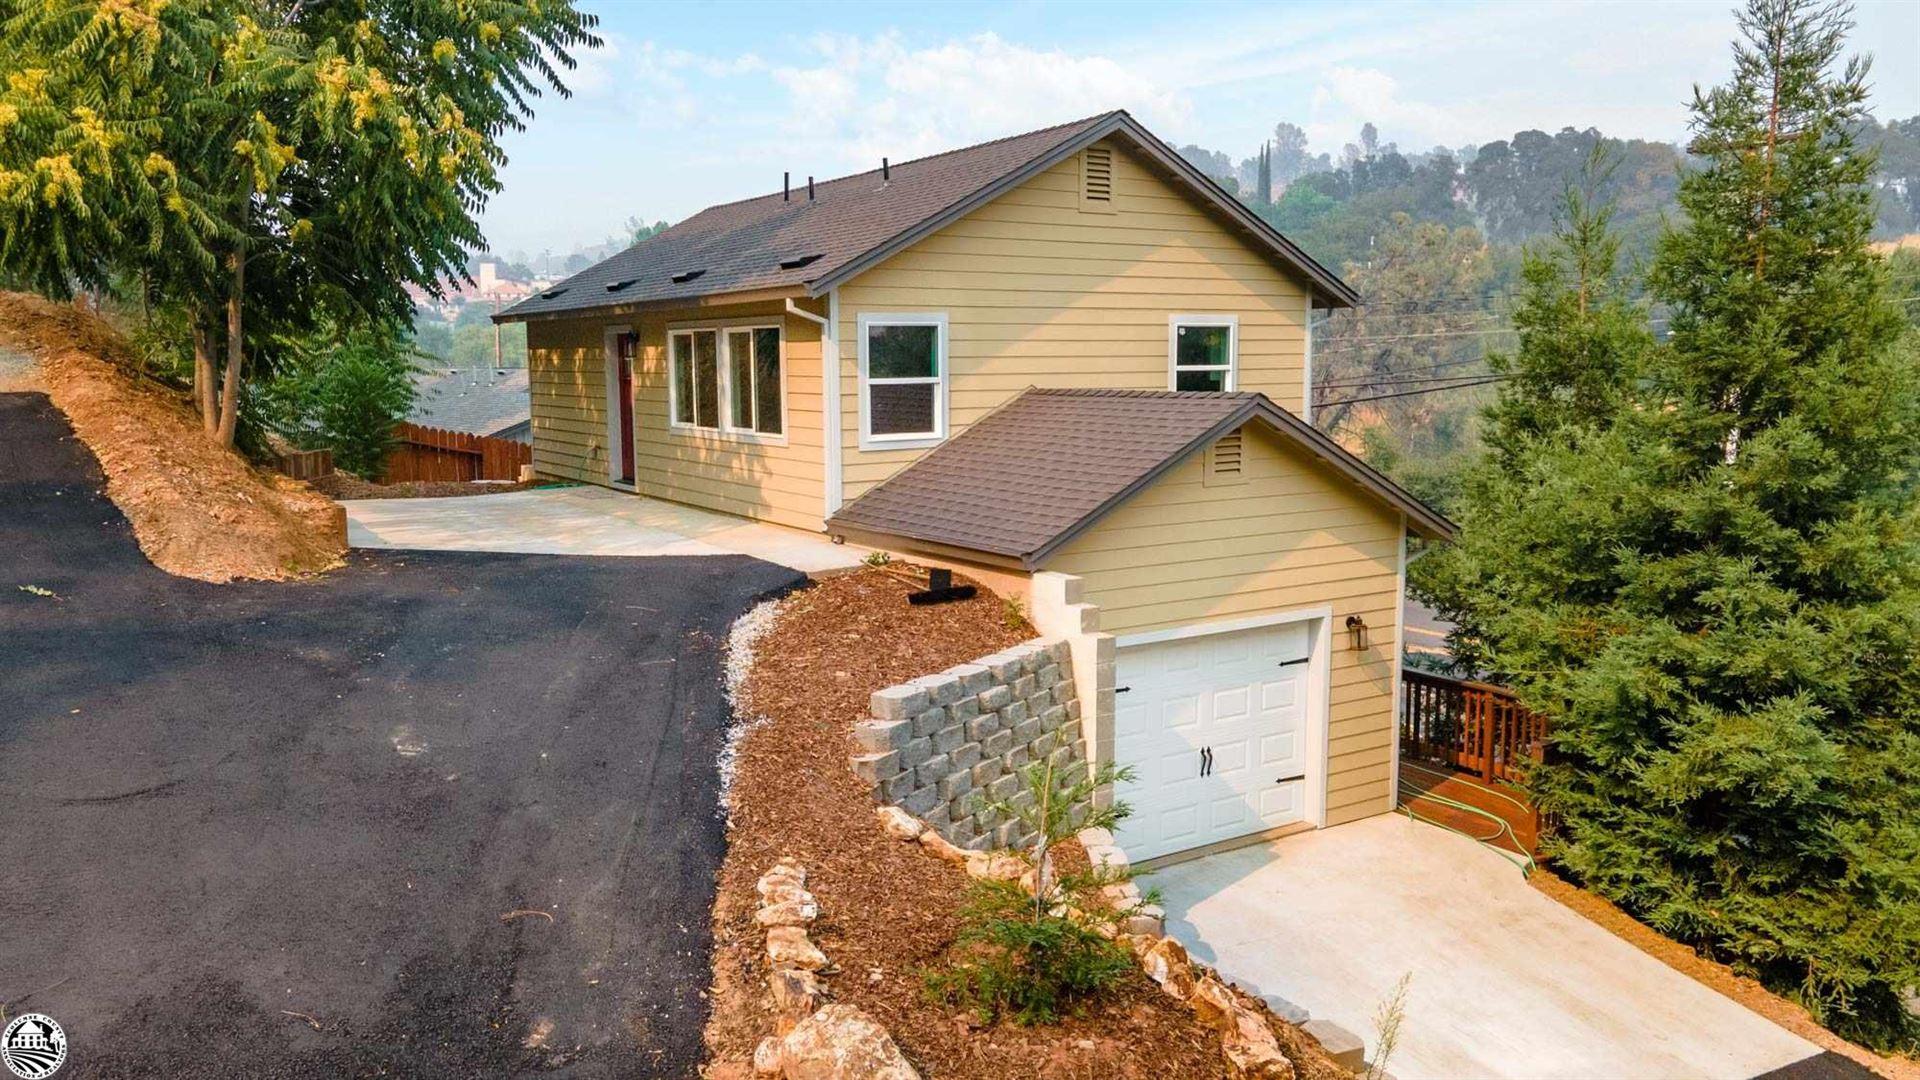 1140 S Washington Street Street, Sonora, CA 95370 - MLS#: 20200612